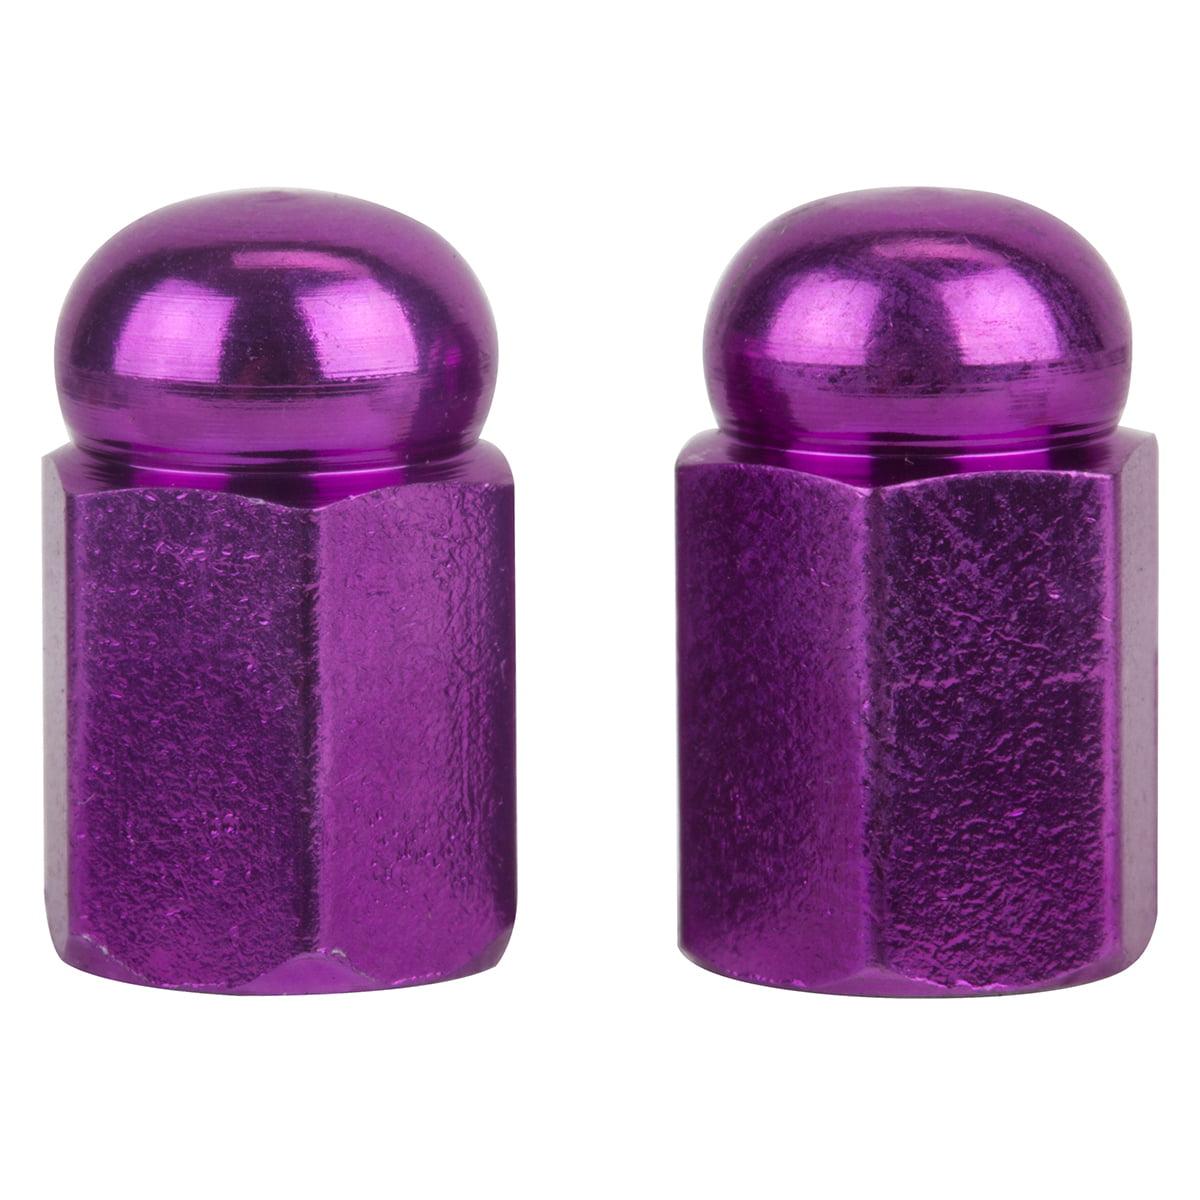 Trick Top Valve Caps Hex Dome Purple